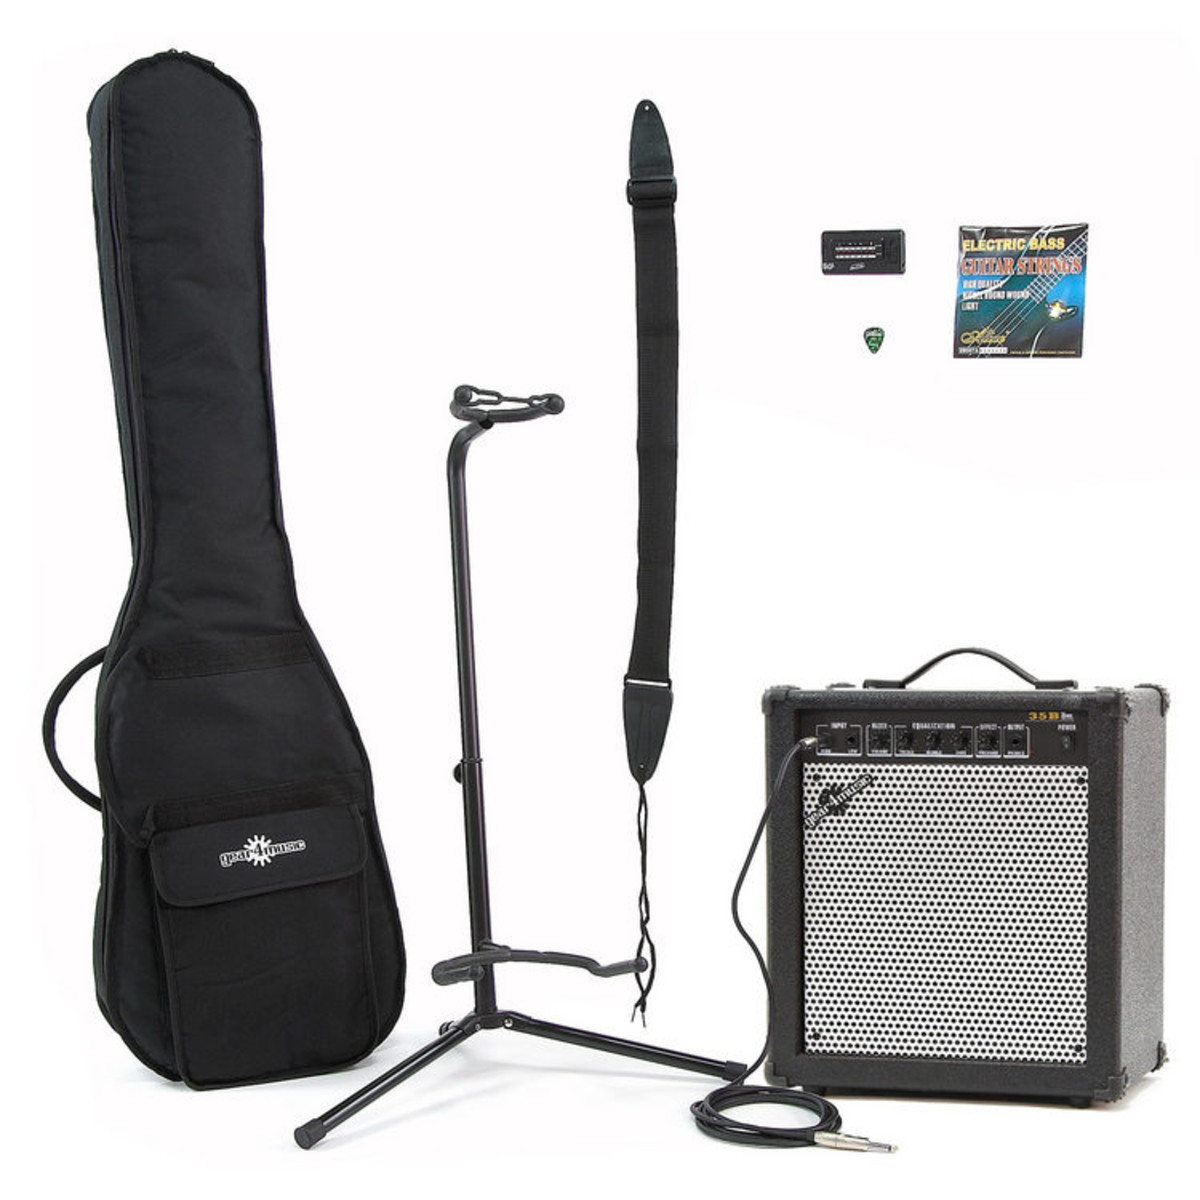 Image of 35 Watt Bass Amp & Accessory Pack